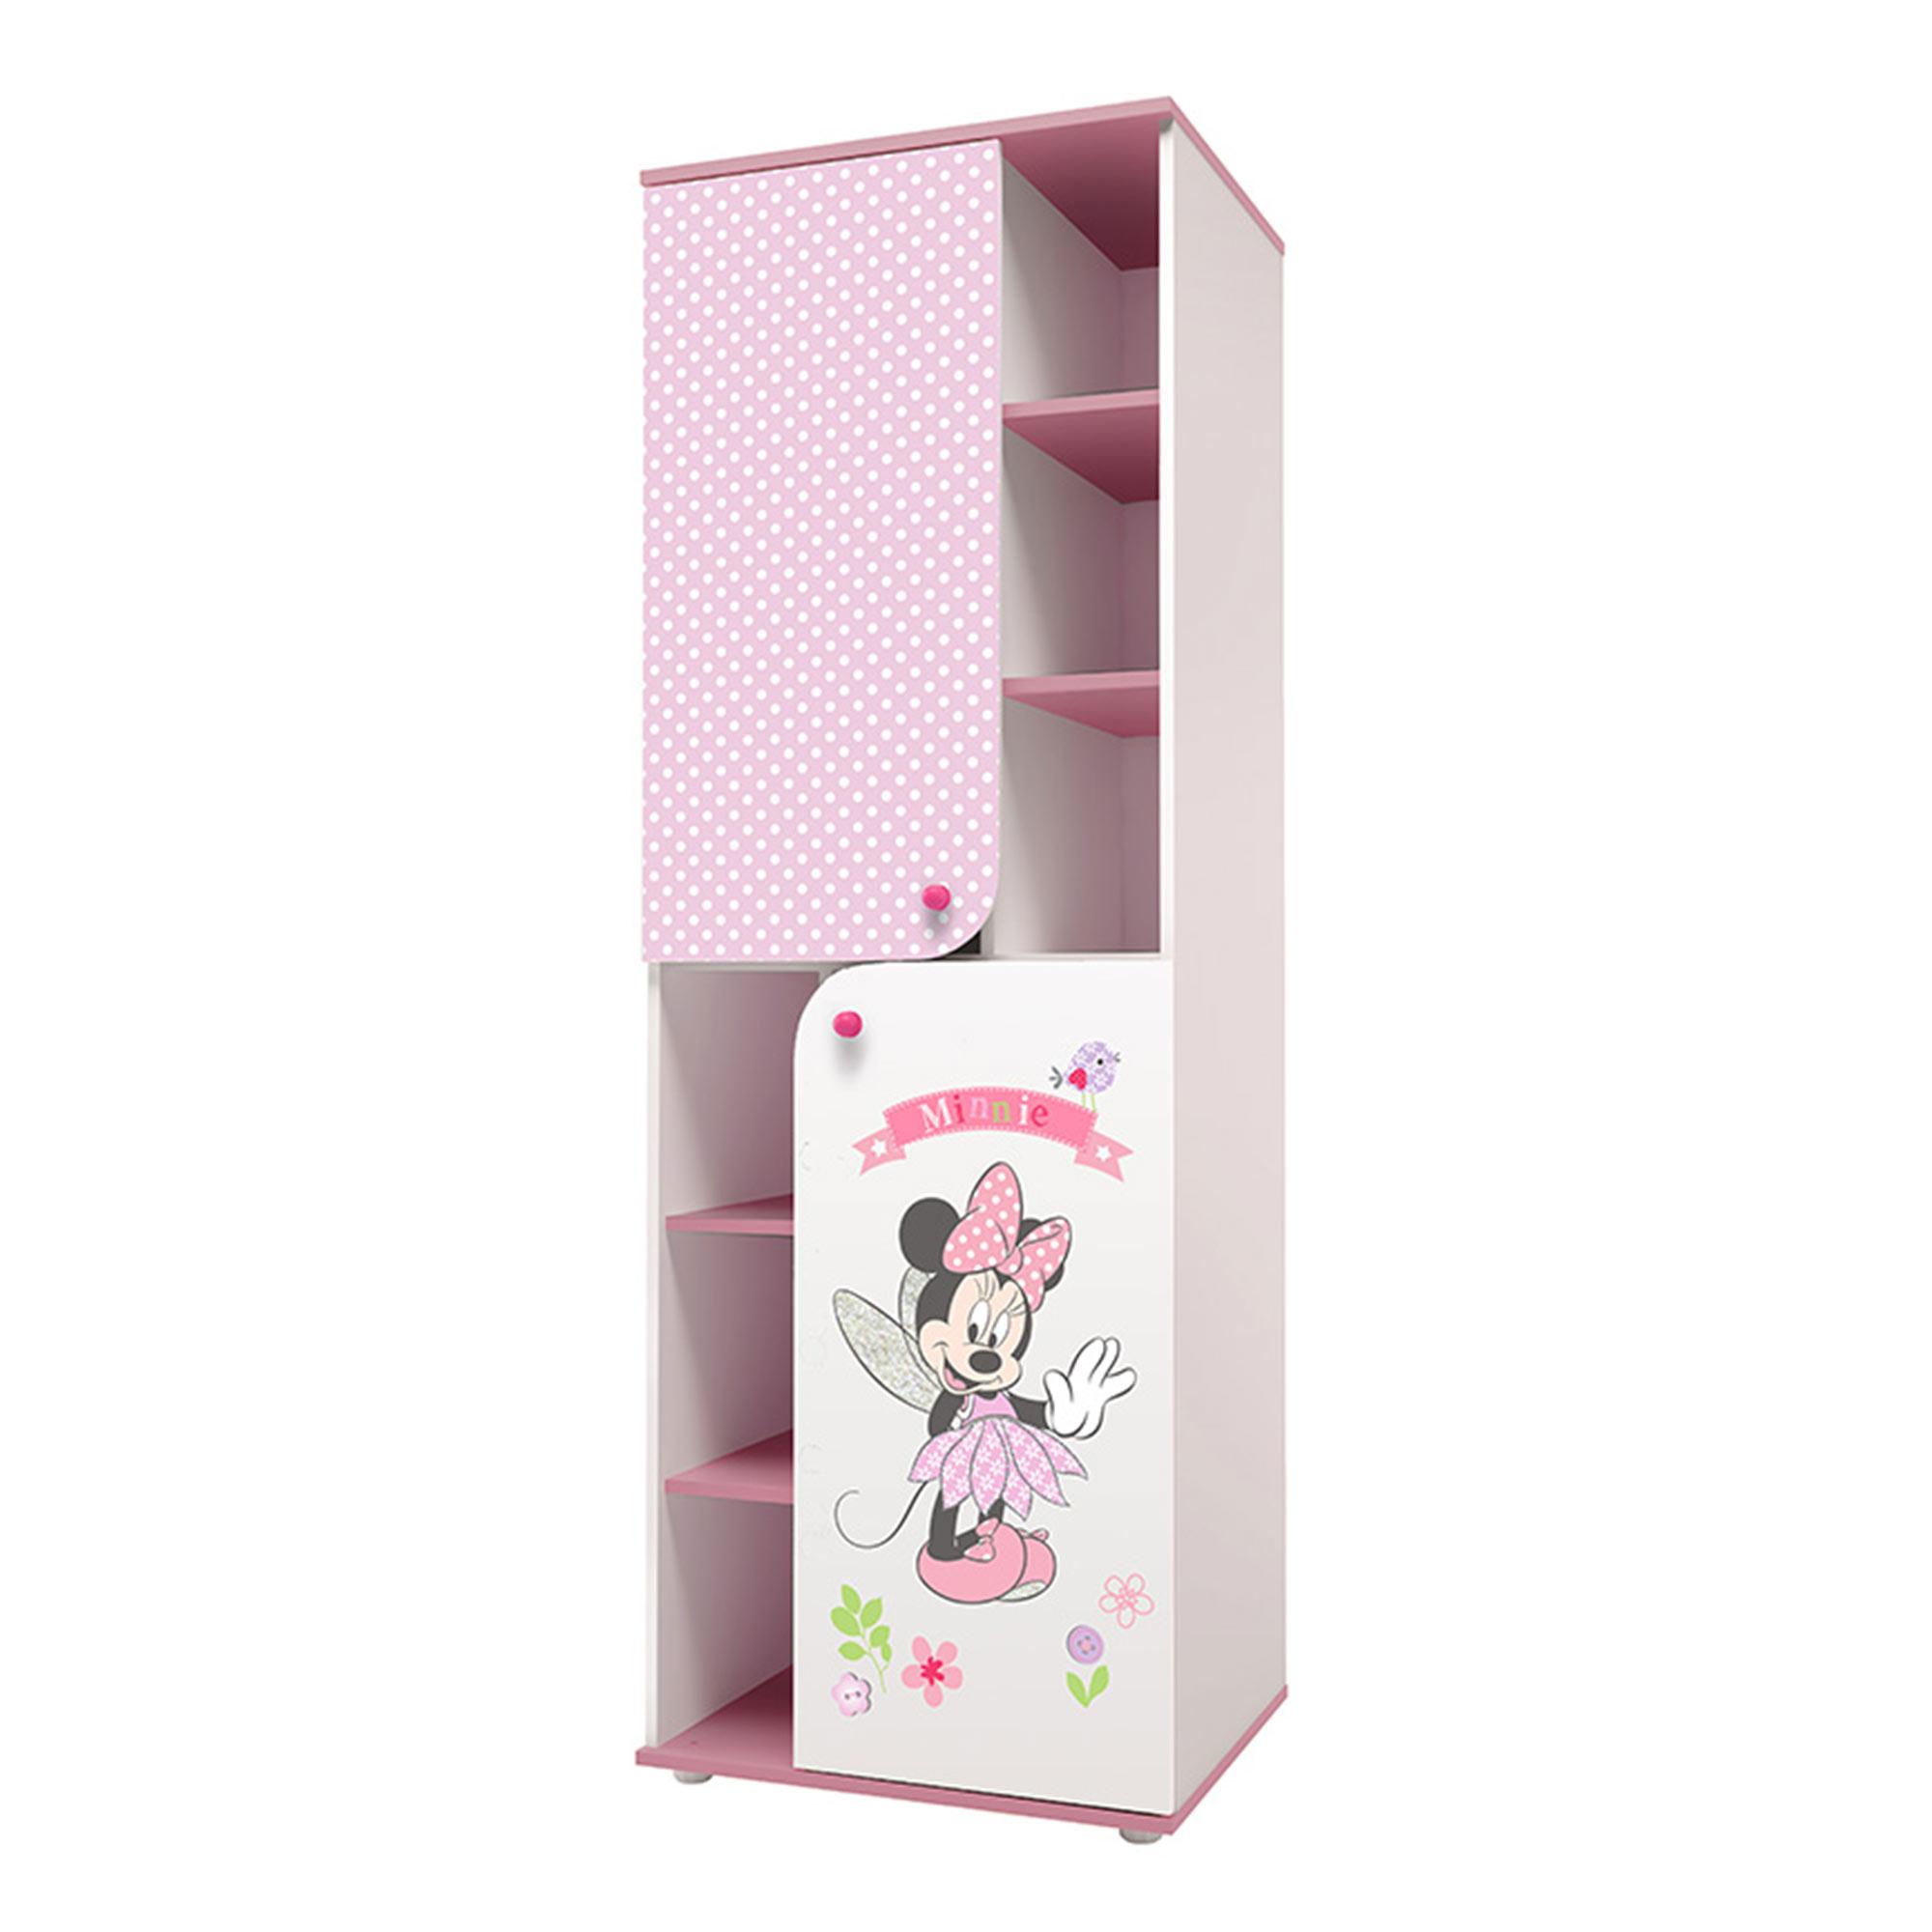 Шкаф-пенал Polini kids Disney baby Минни Маус-Фея, белый-розовый 190х65,2х52